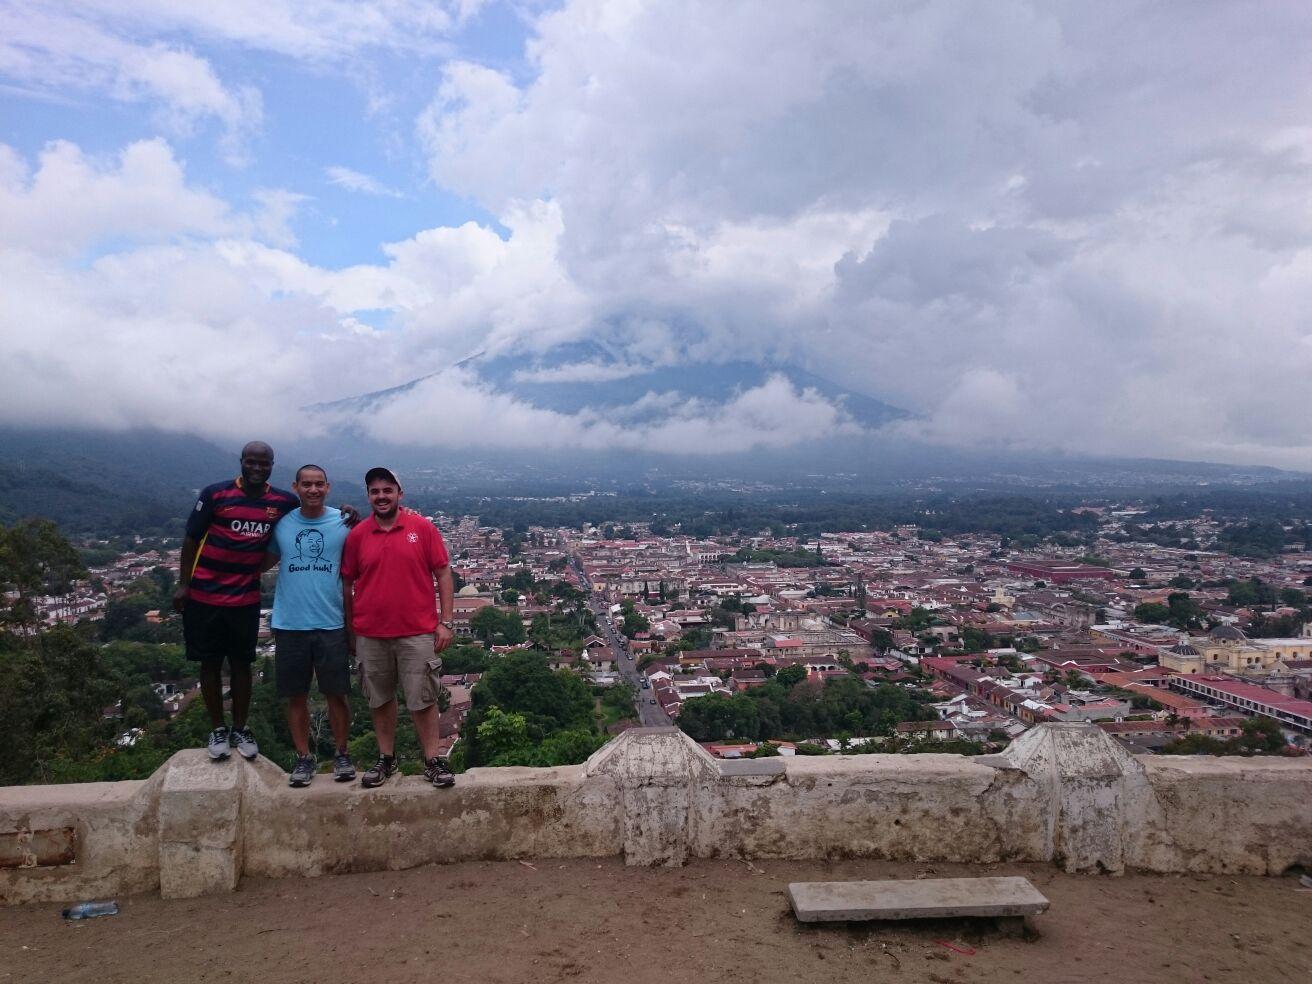 Sebastian, Man, and I on a hill outside the city.